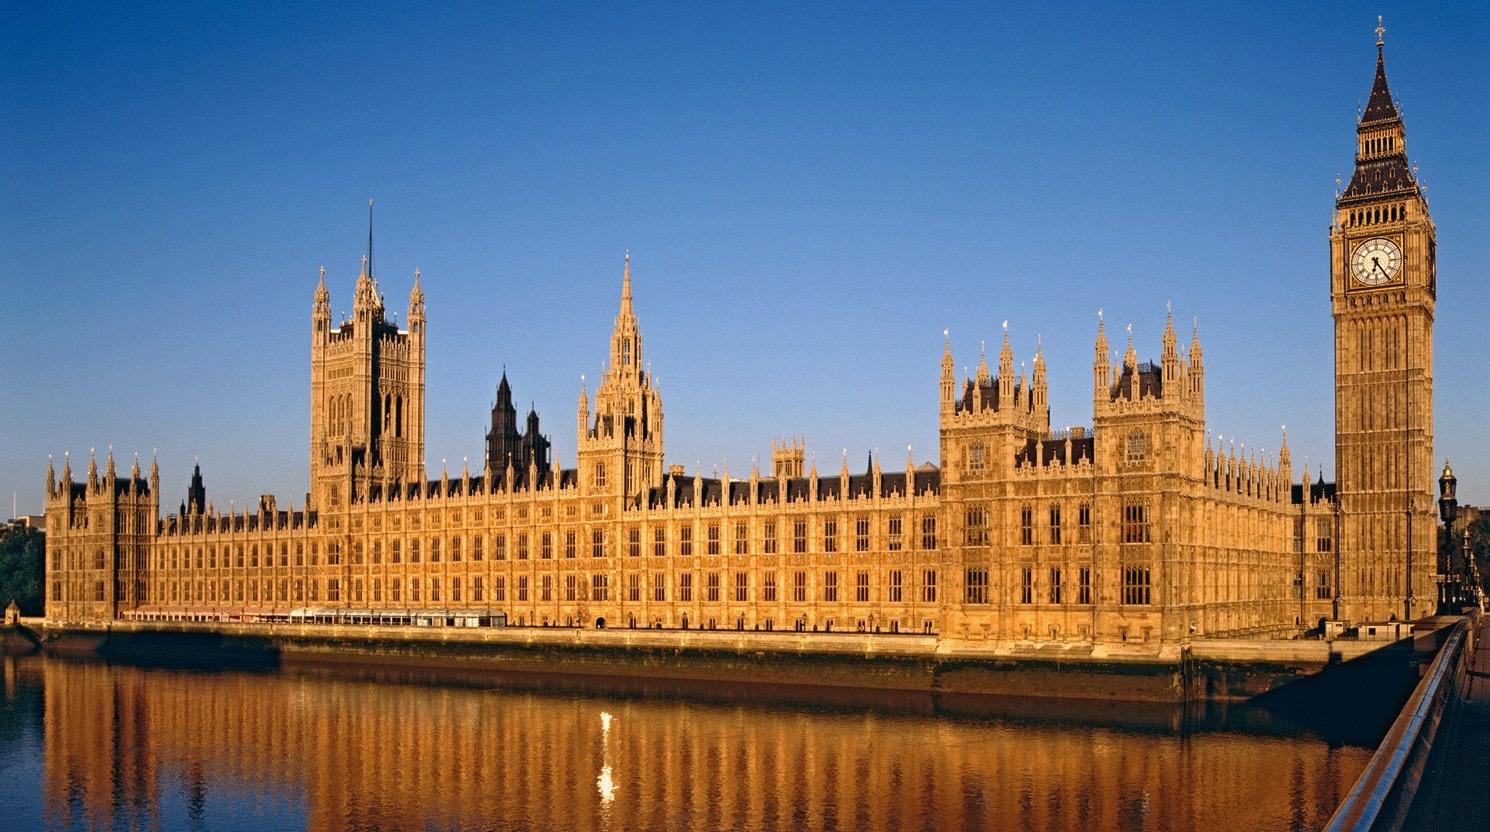 clio-walks-london_28135400483_o